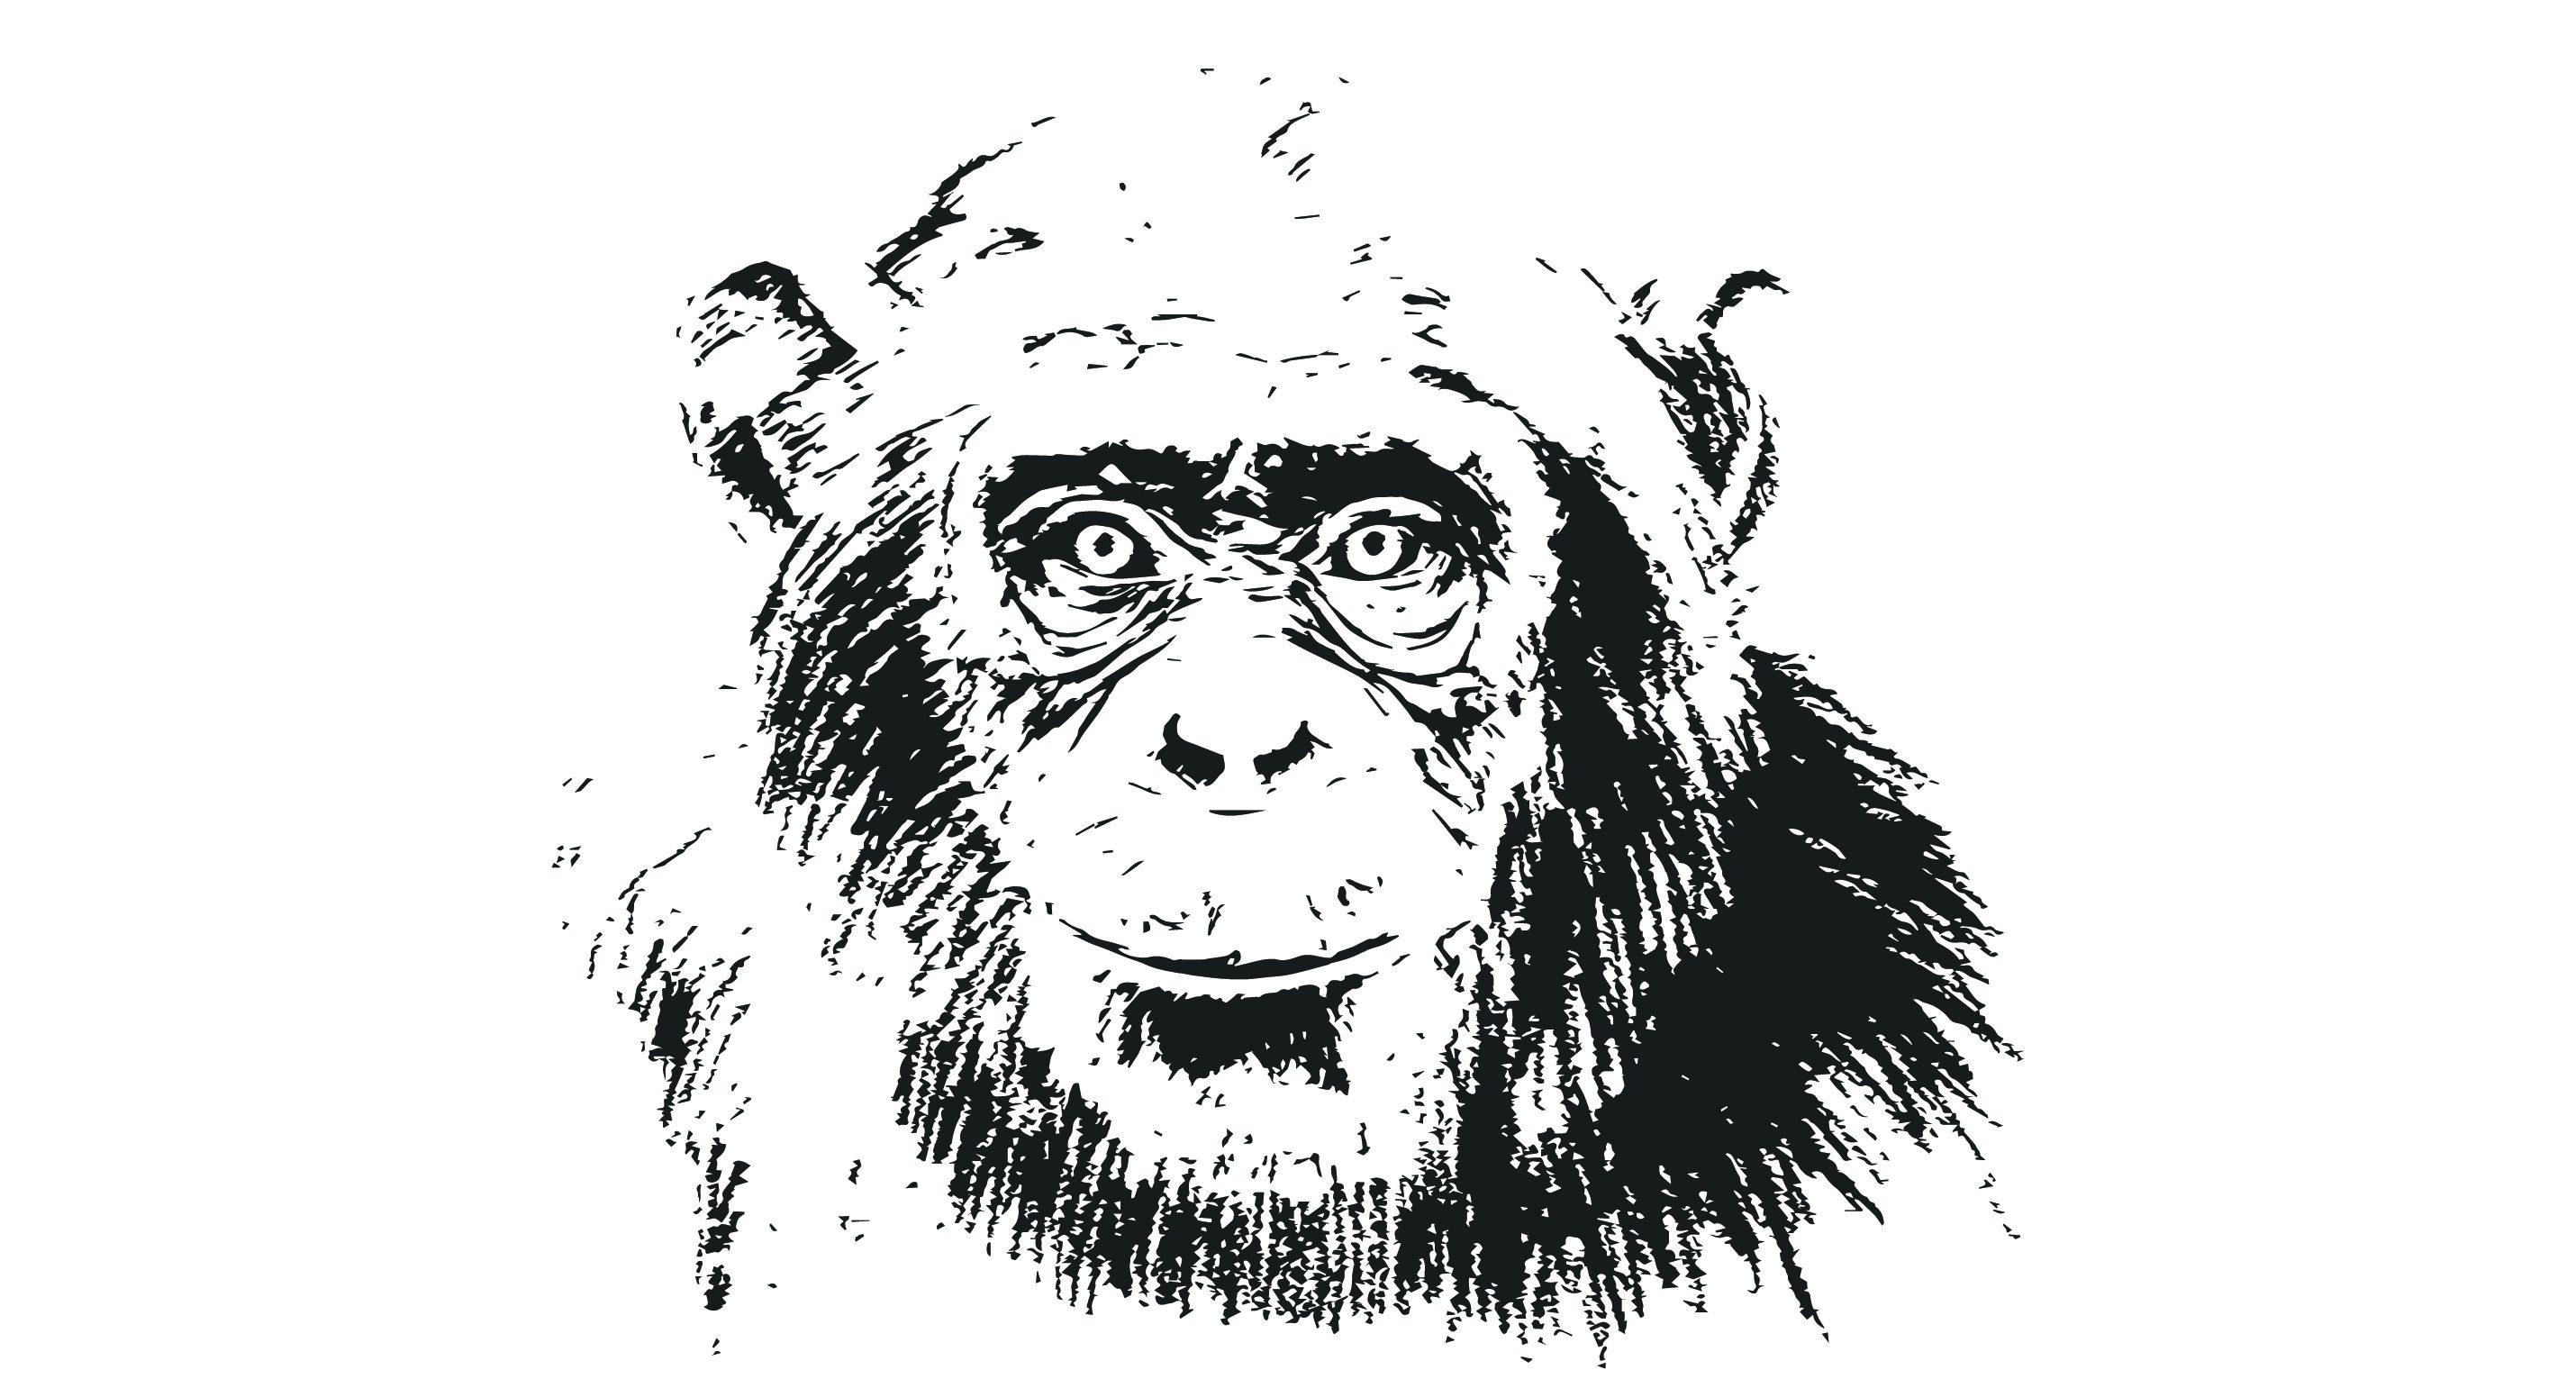 Greater Ape